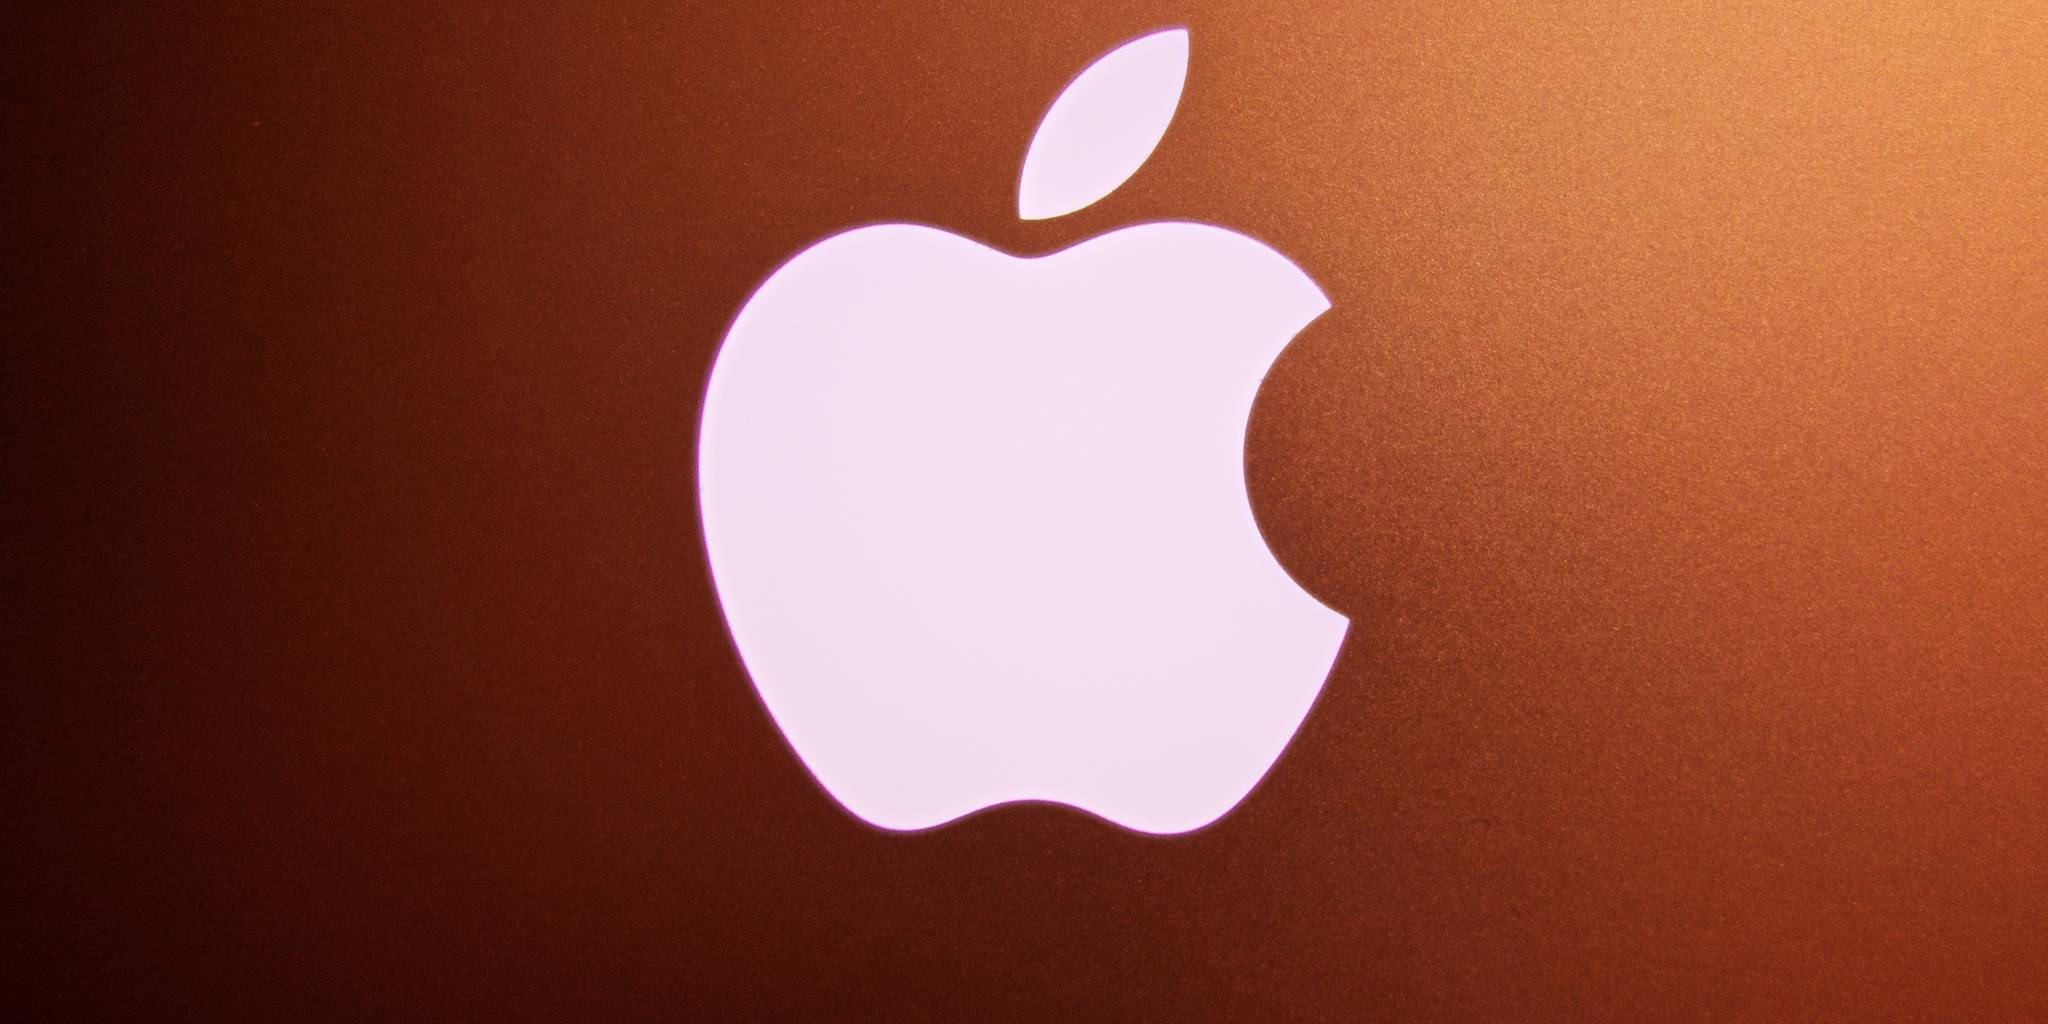 Apple Inc. clipart apple iphone Logo Know Apple's apple iPhone